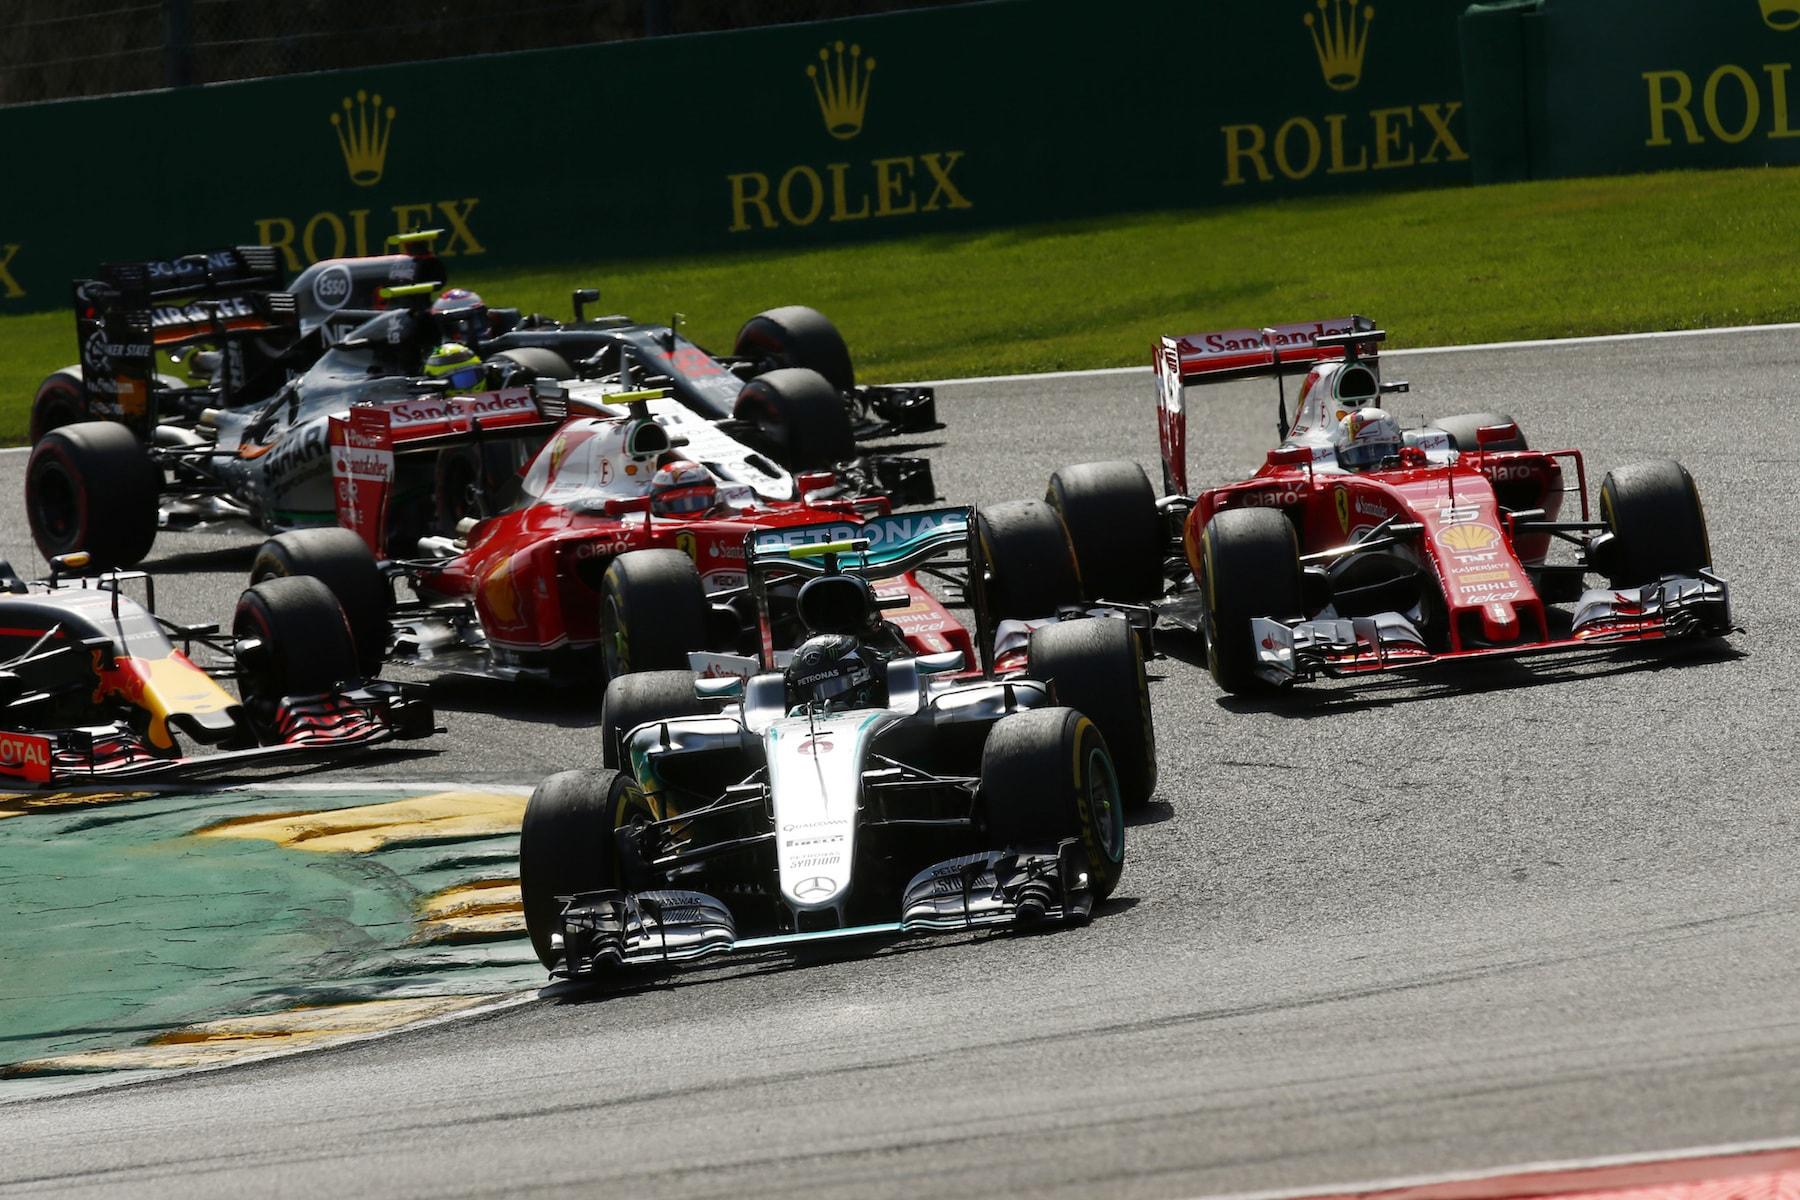 Salracing - Belgian Grand Prix start